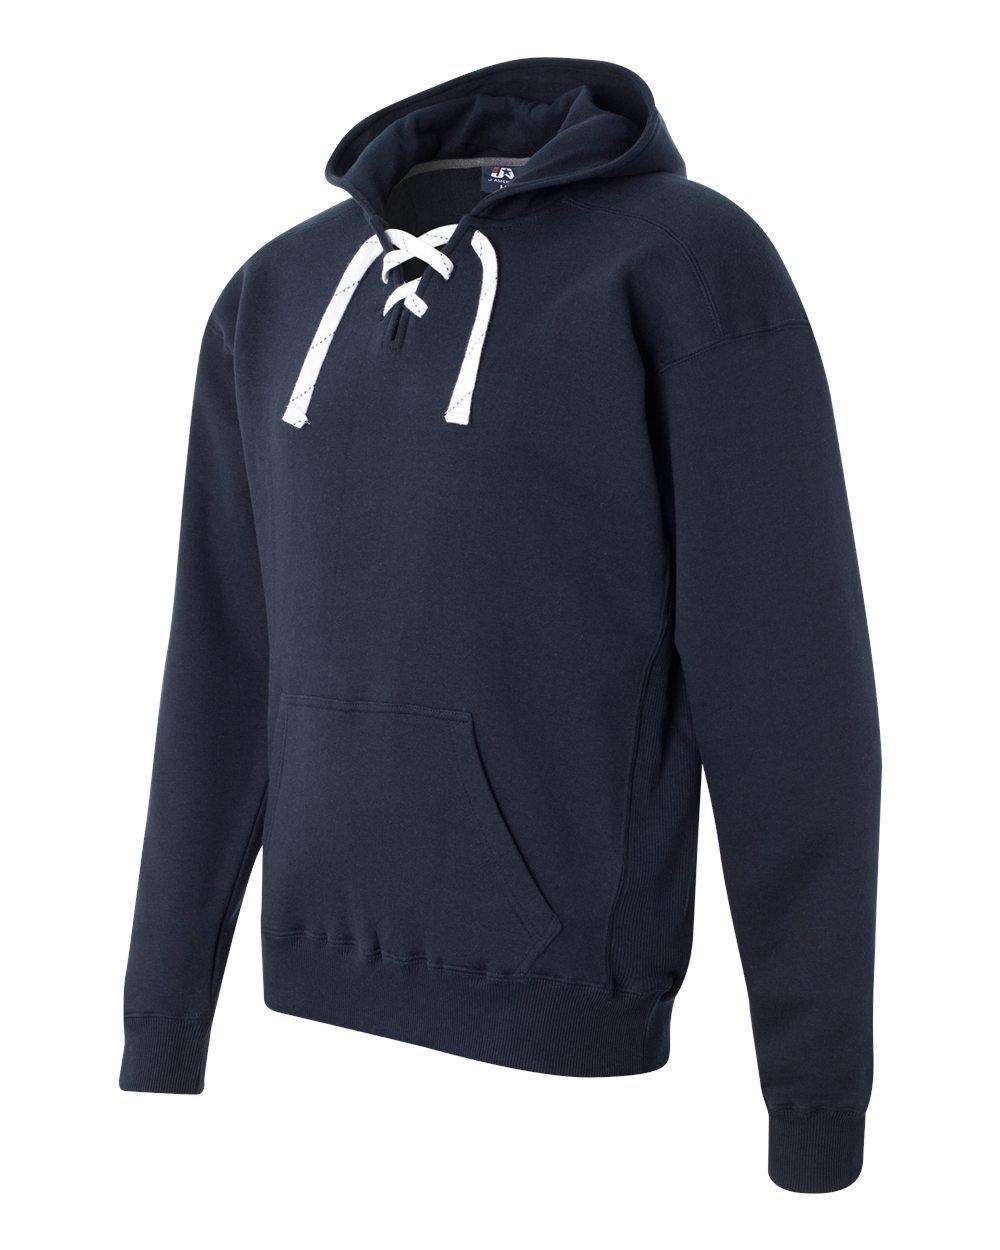 Navy Hockey Hood Sweatshirt: 80% Ringspun Cotton, 20% Polyester Fleece Fabric.,Navy,3X-Large